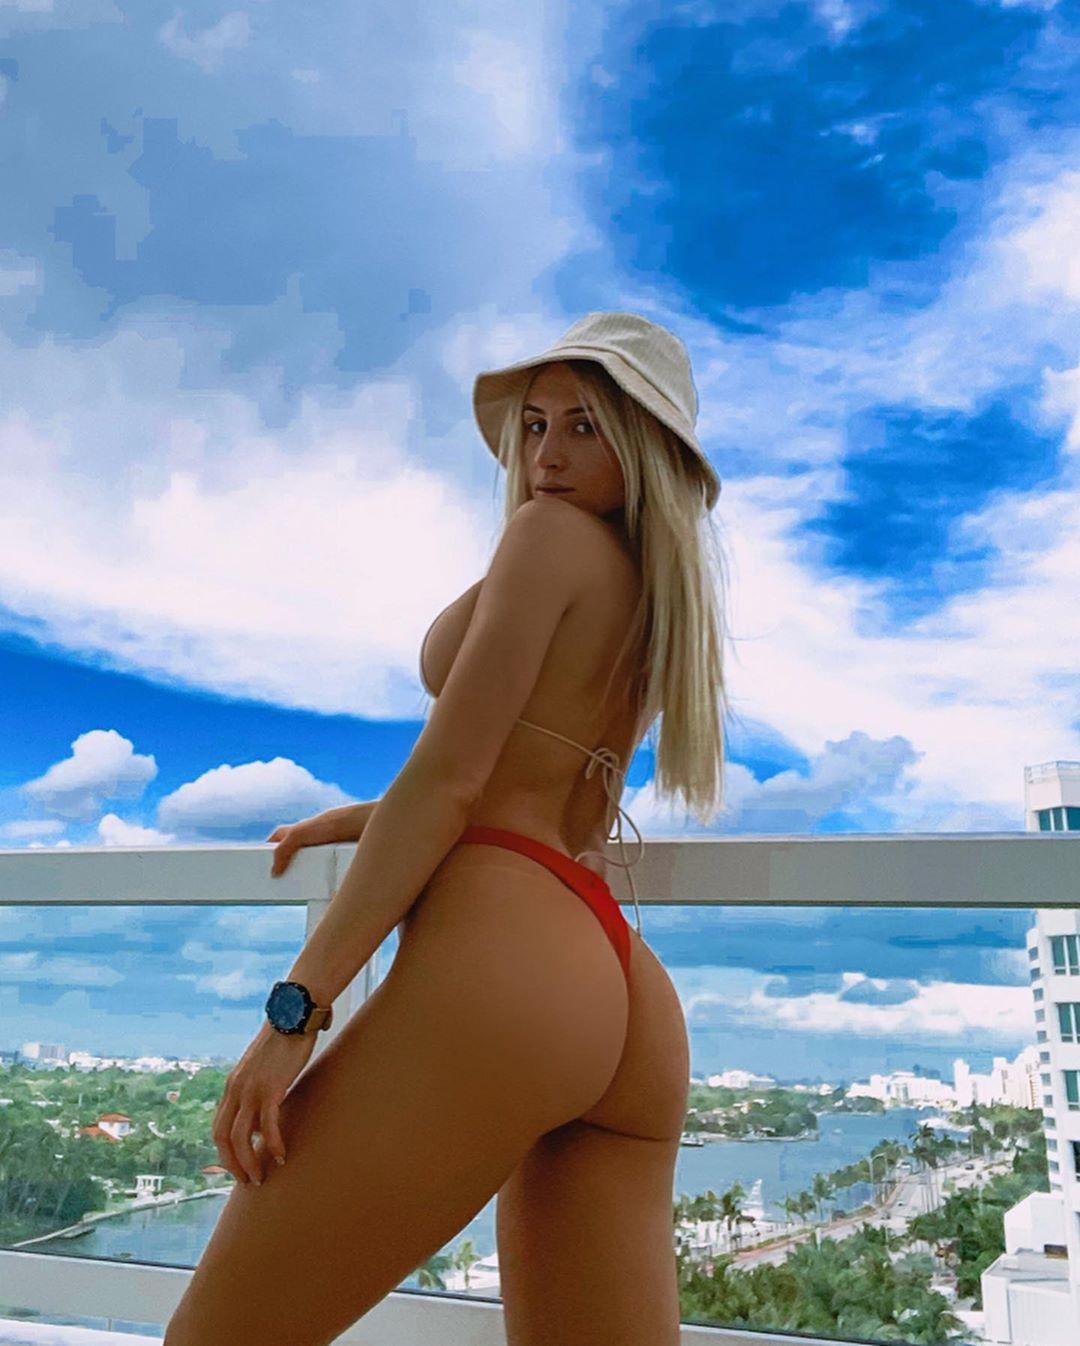 Lauren Dascalo Nude Onlyfans Leaked! 0022